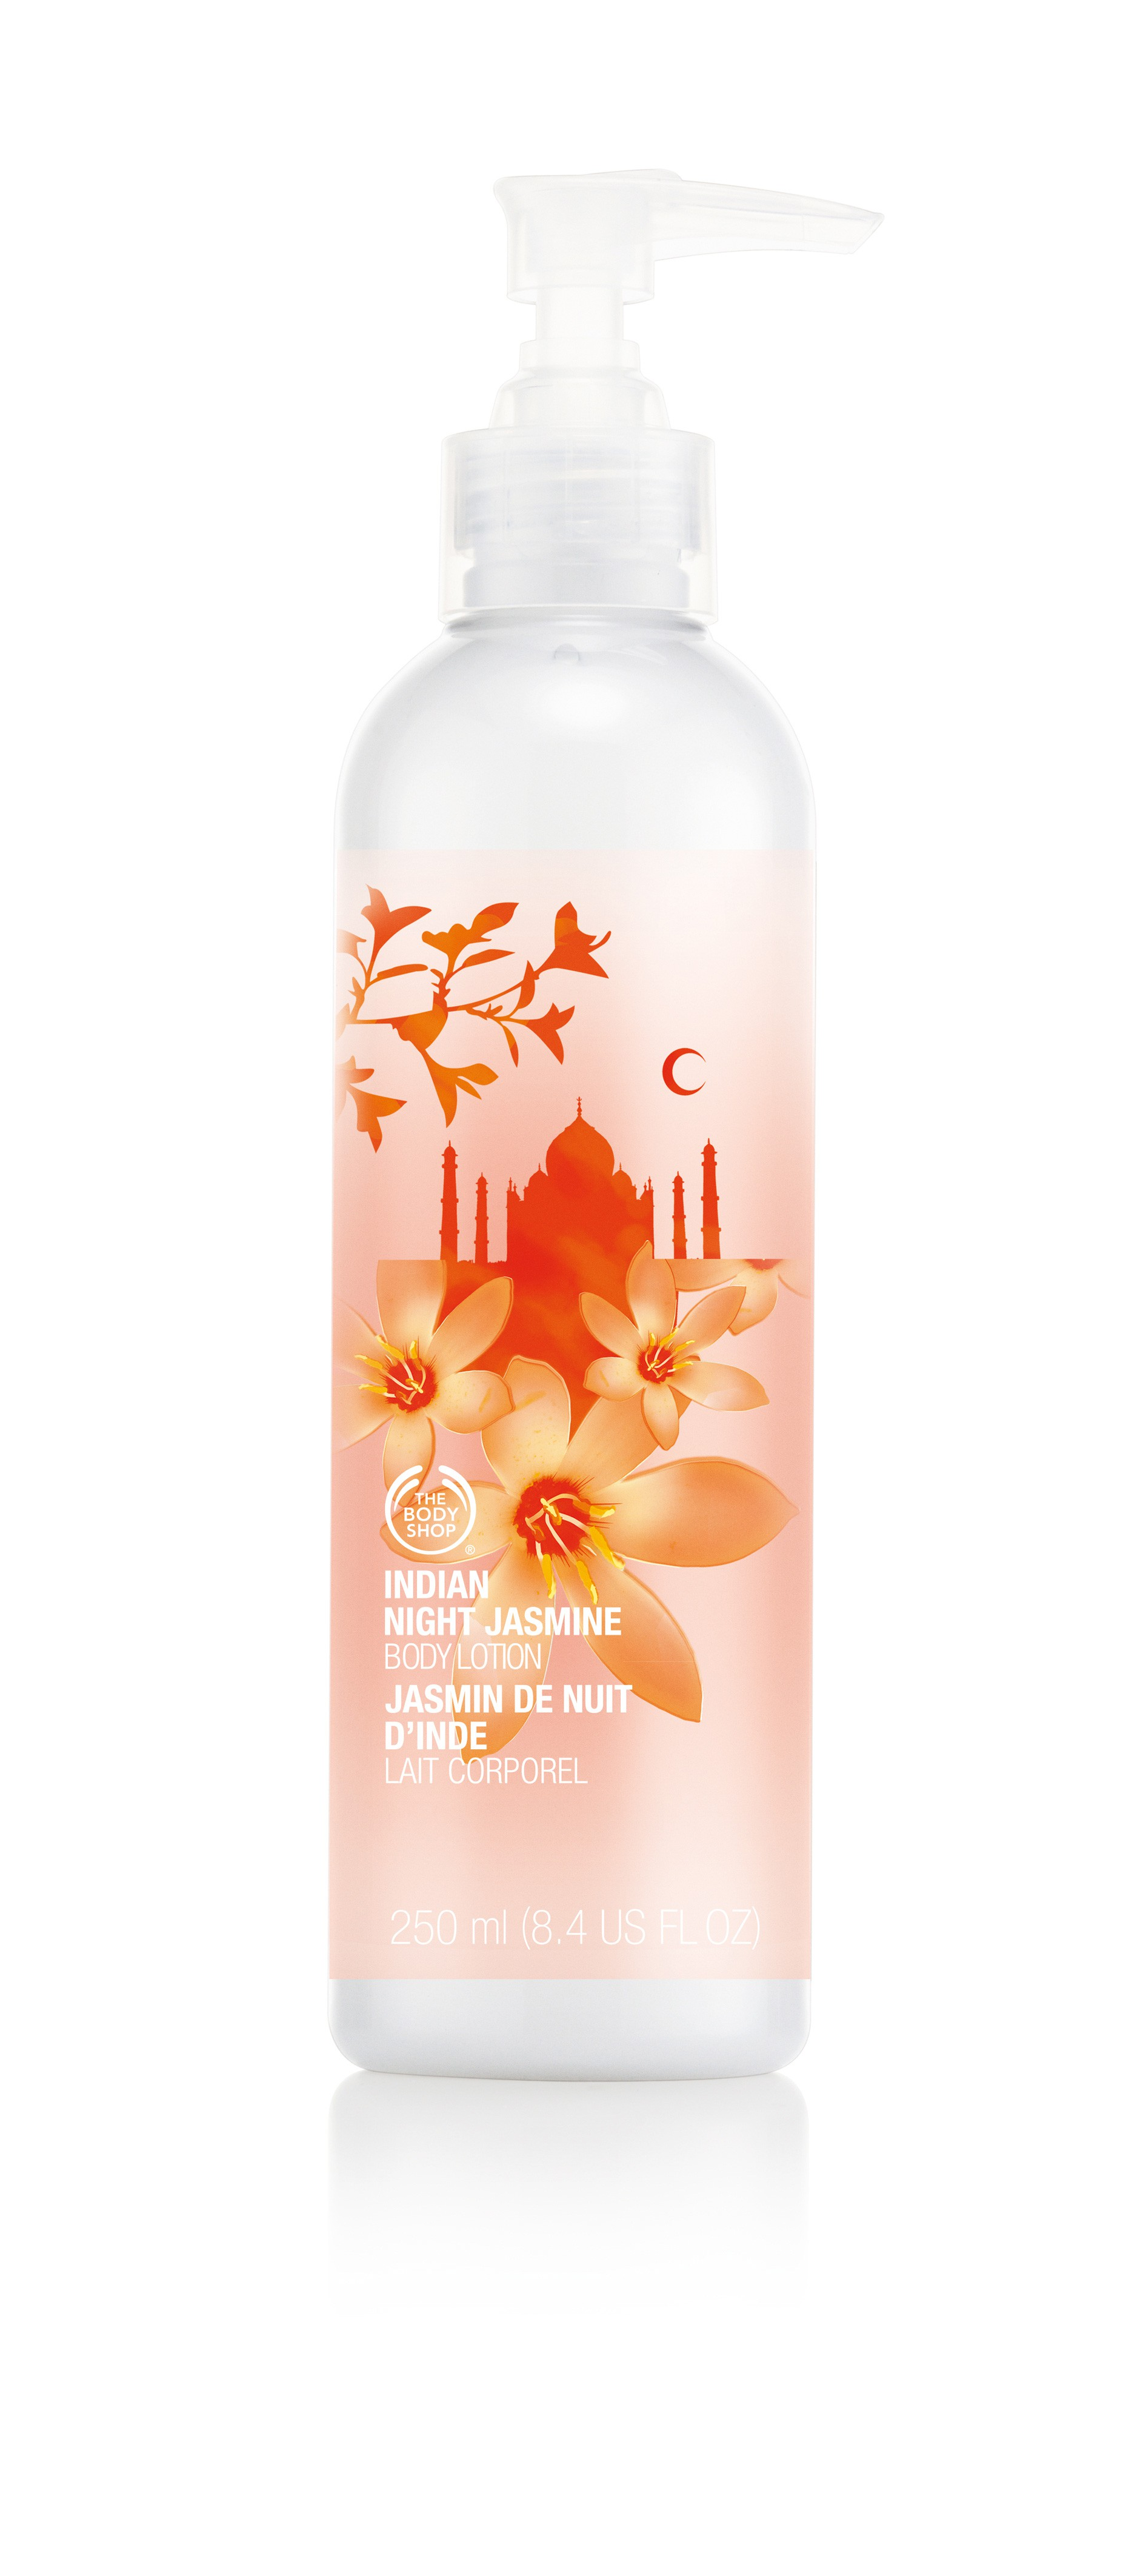 The Body Shop Indian Night Jasmine аромат для женщин